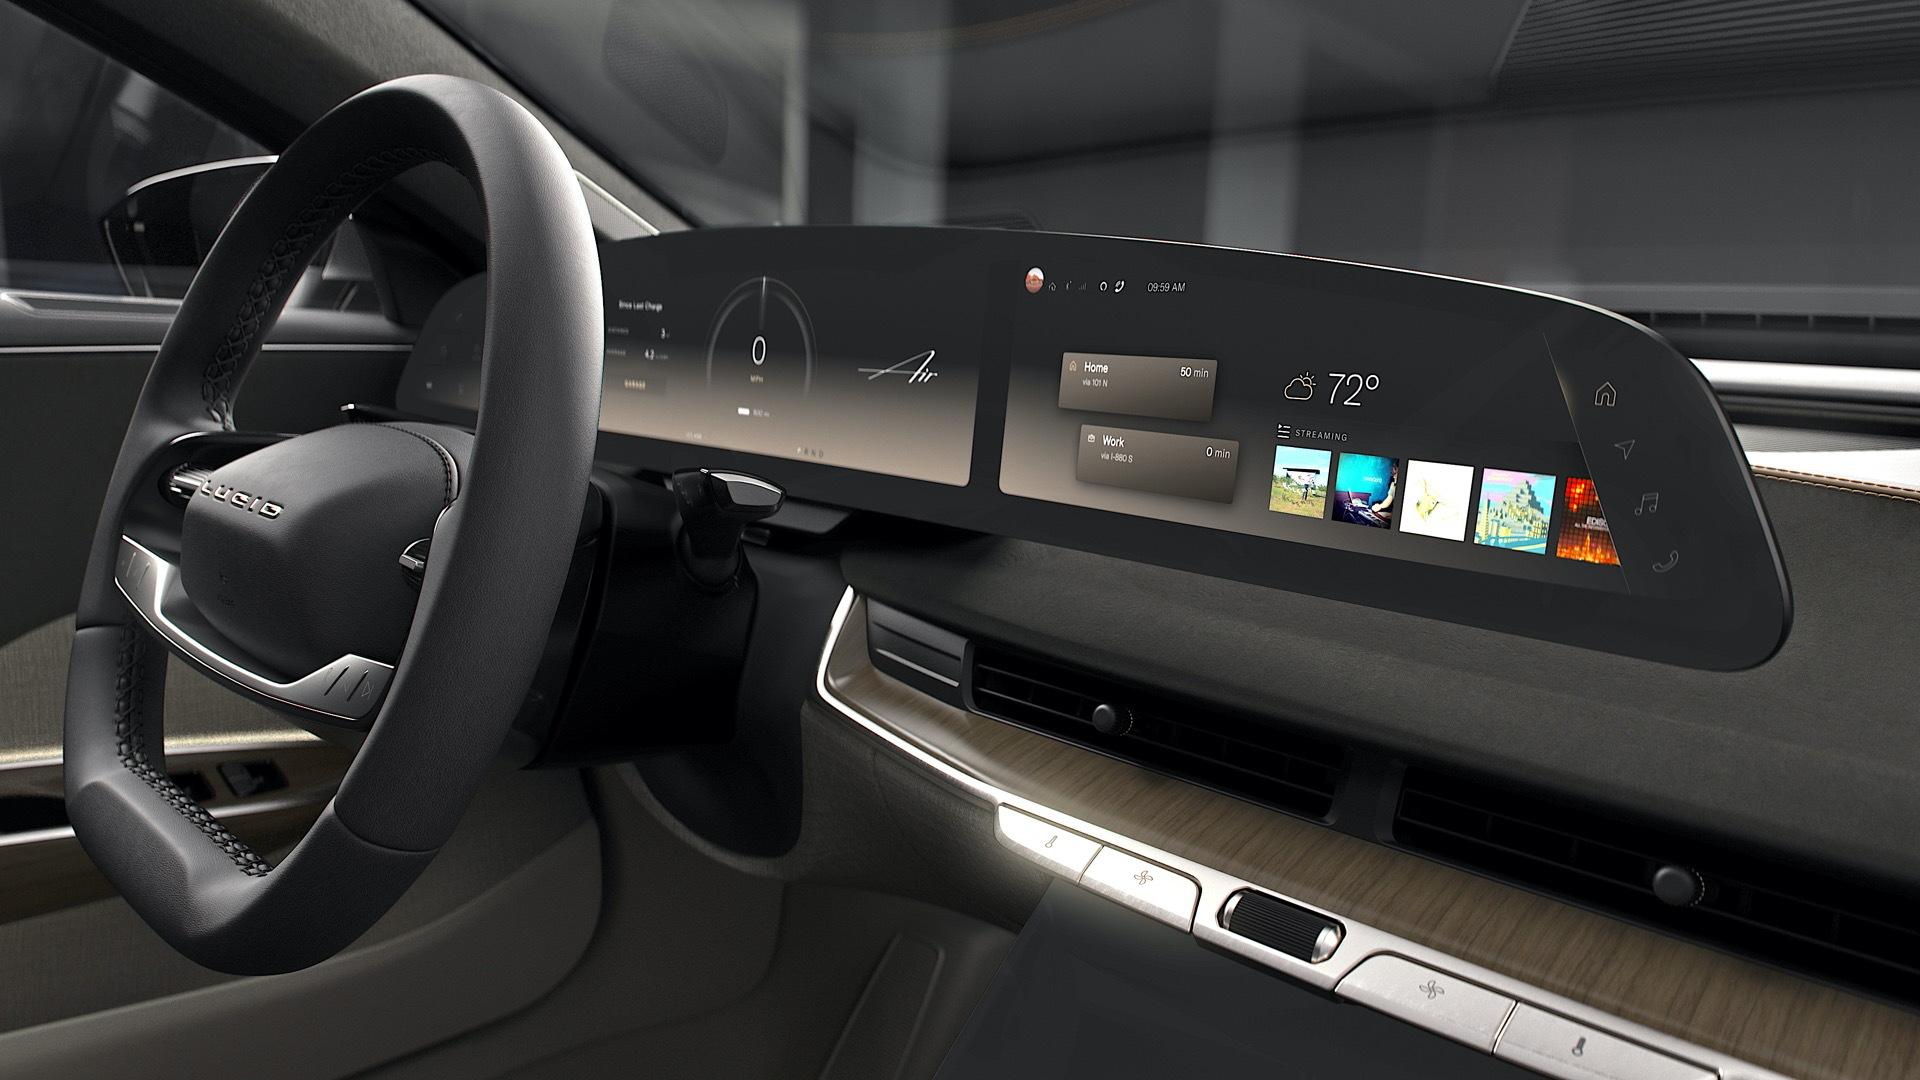 Lucid Air interior  -  user interface